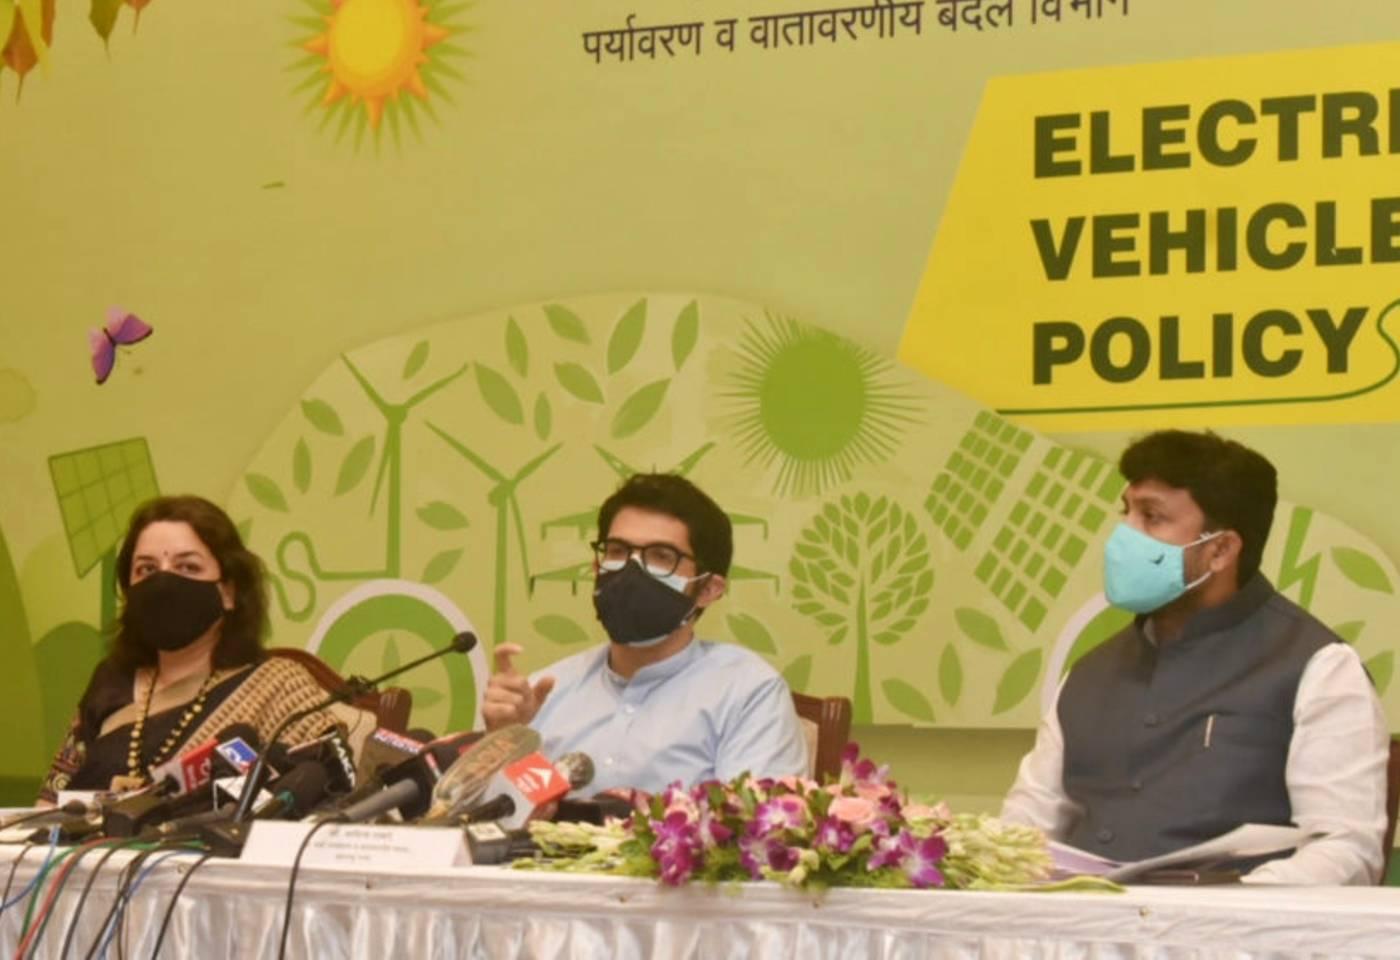 Maha Electric Vehicle Policy 2021 by MVA Govt Aditya Thackeray